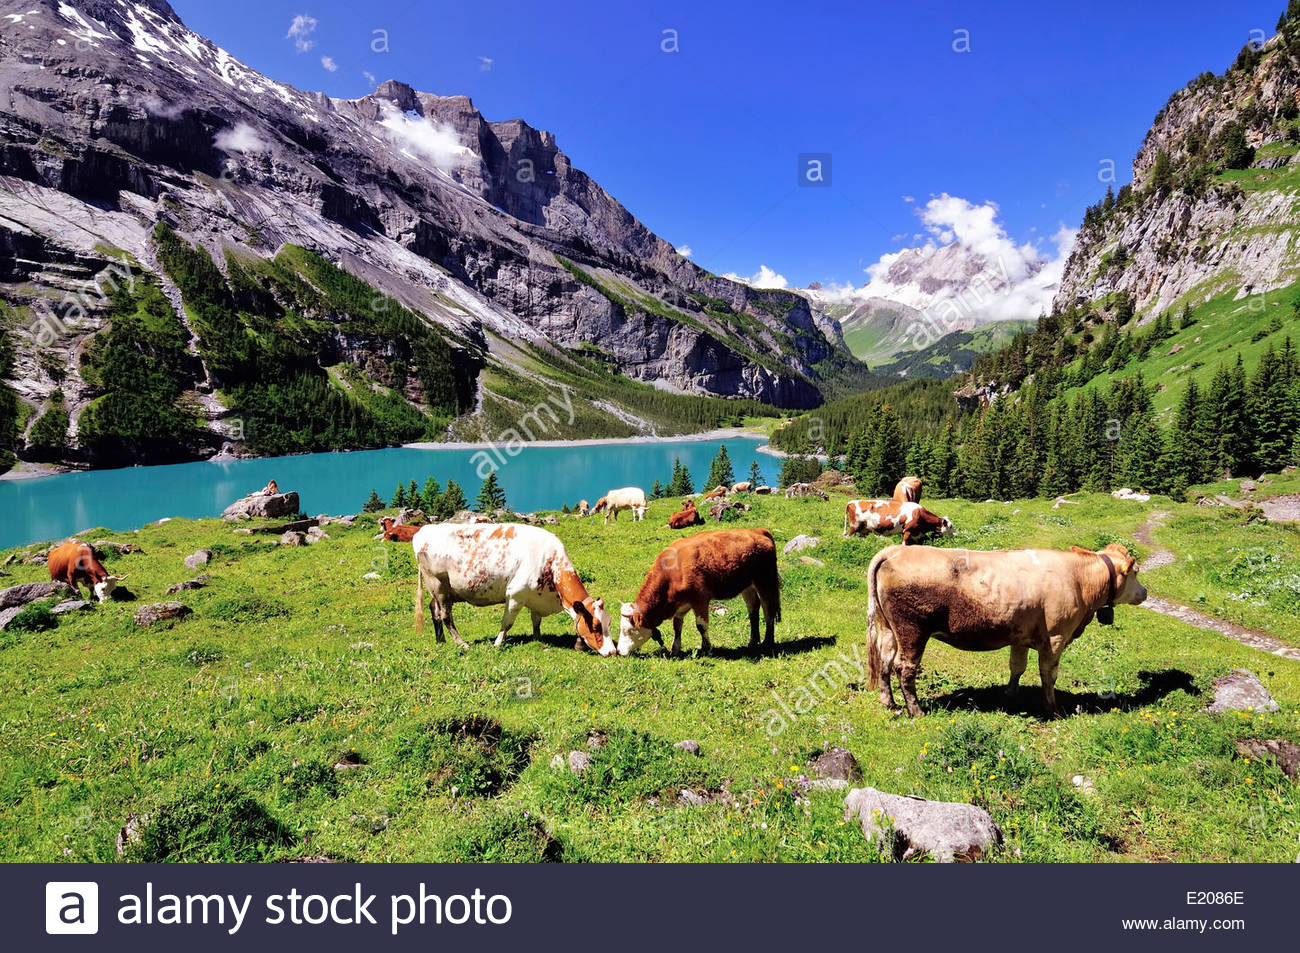 Grazing cows on Oeschinensee, UNESCO World Heritage Site, Kandersteg, Canton of Bern, Switzerland - Stock Image